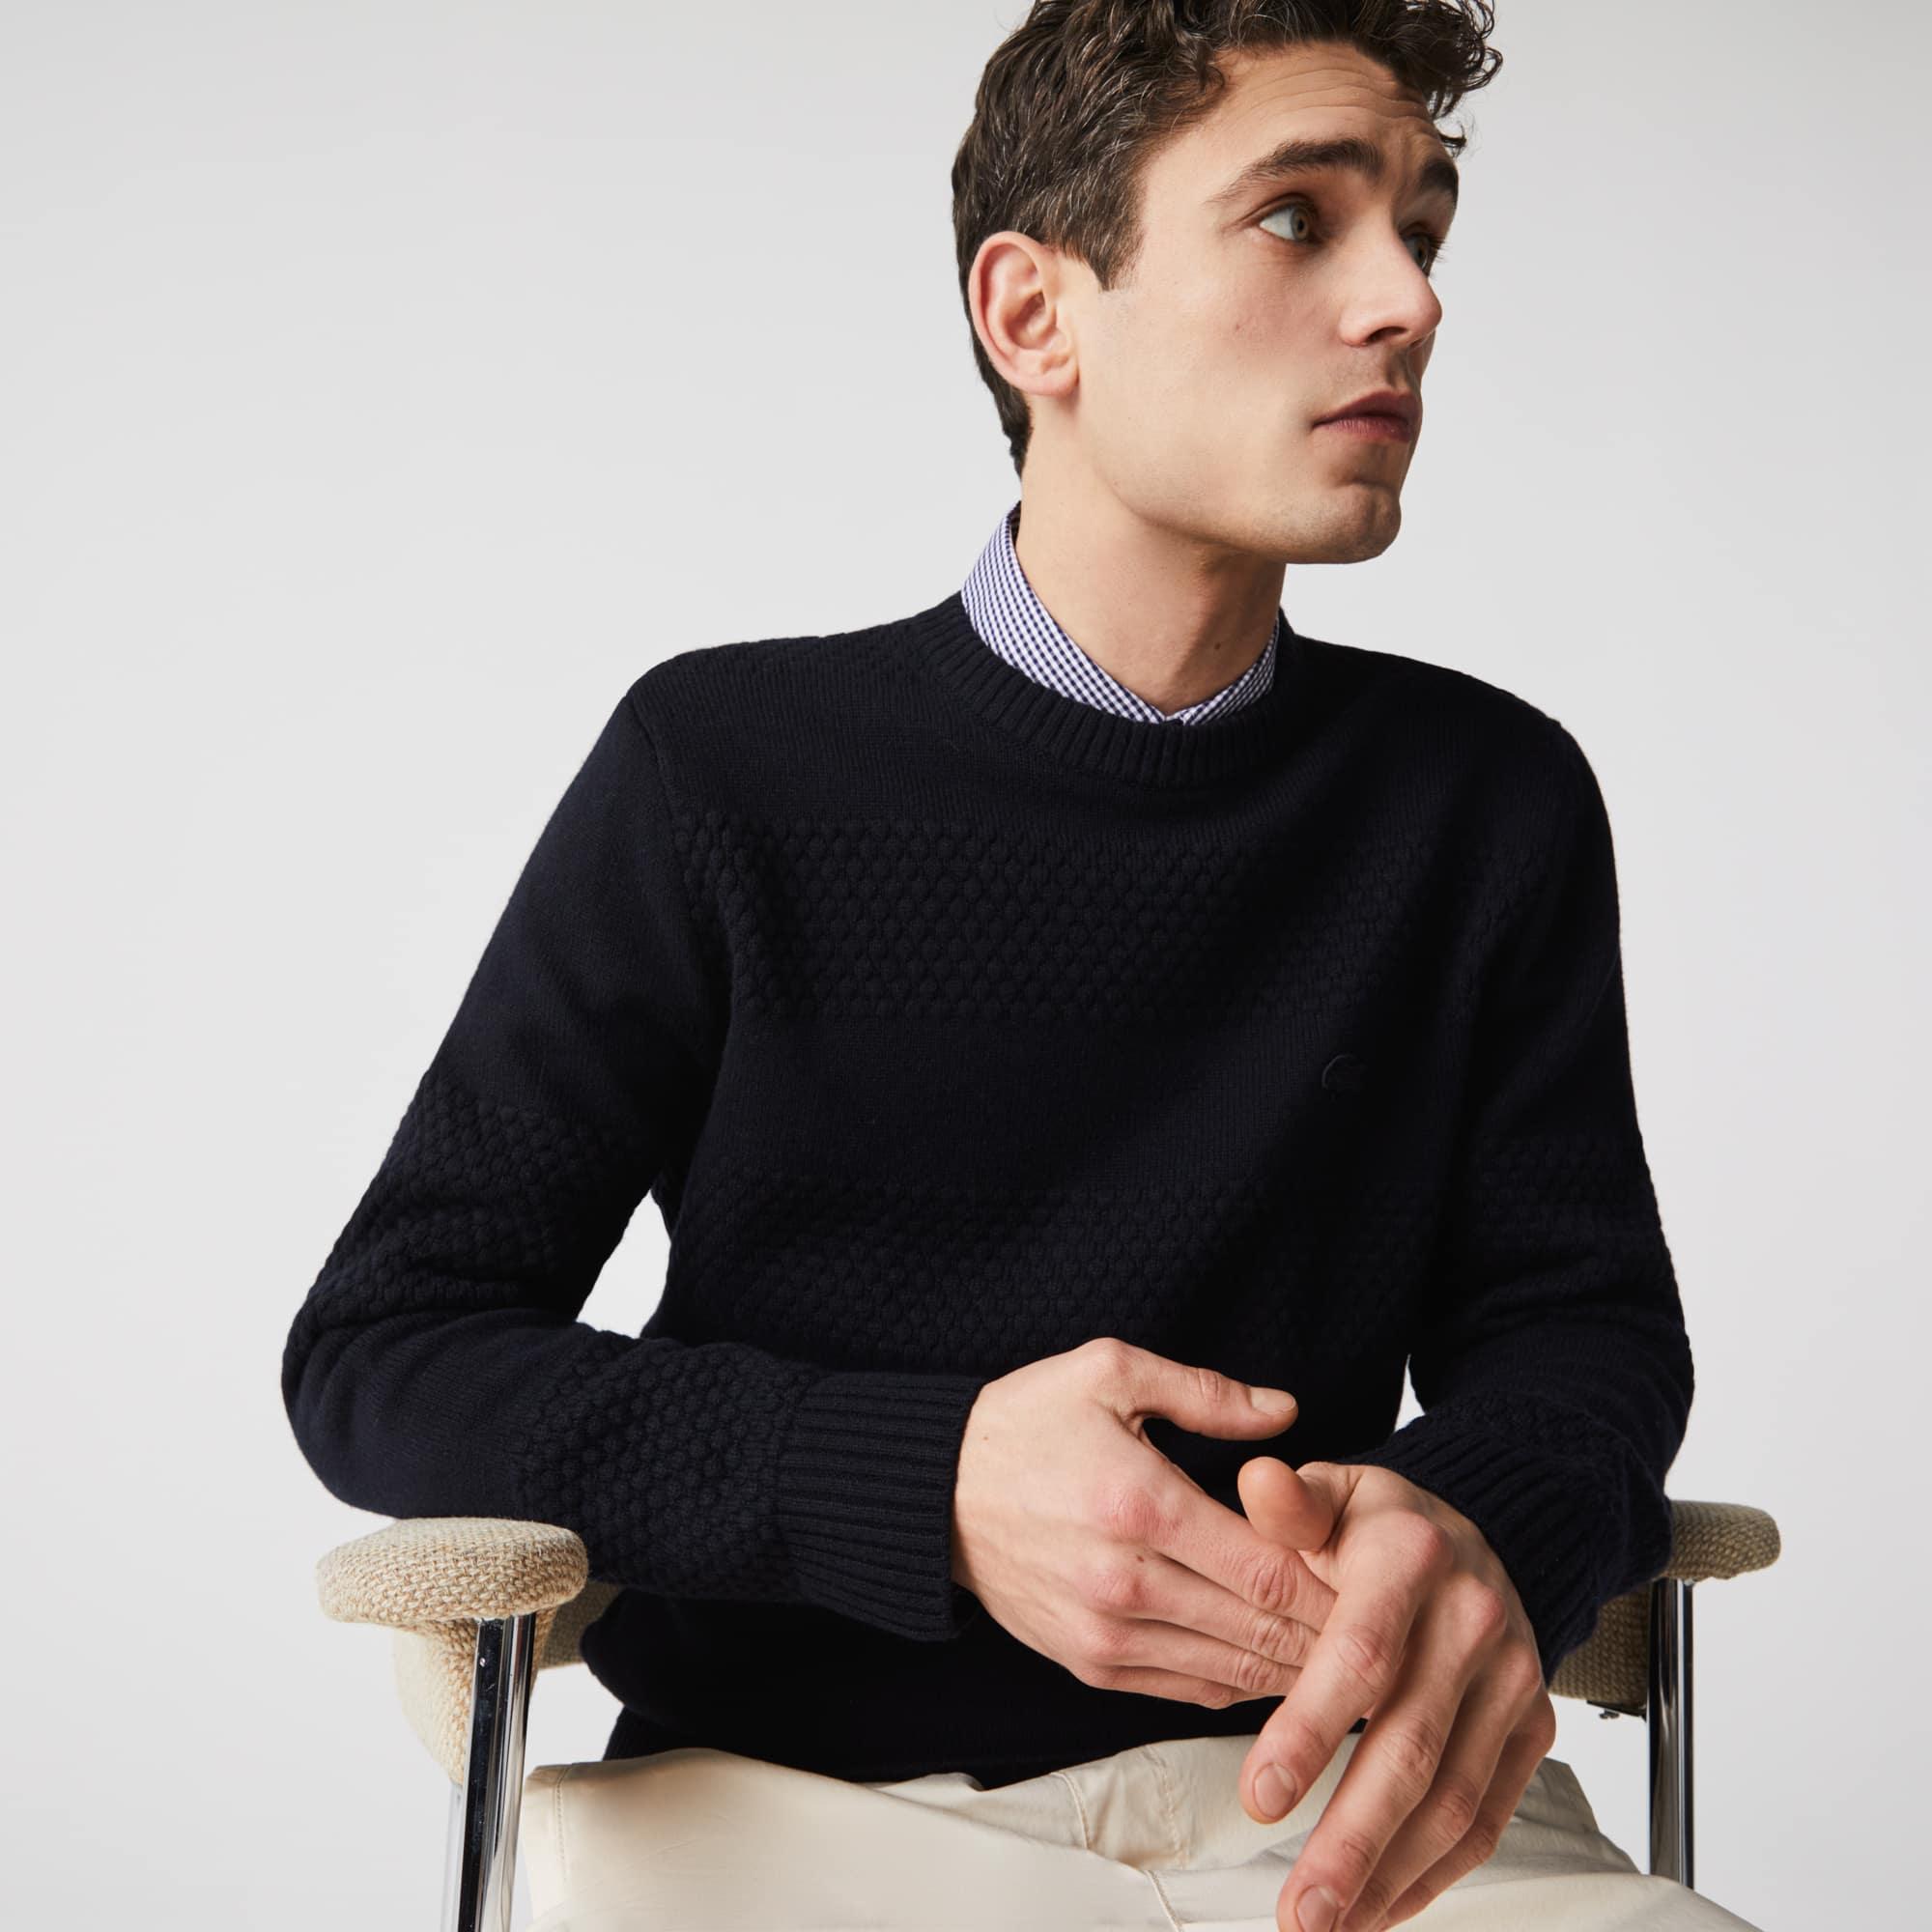 Lacoste Men's Textured Striped Wool-Blend Sweater